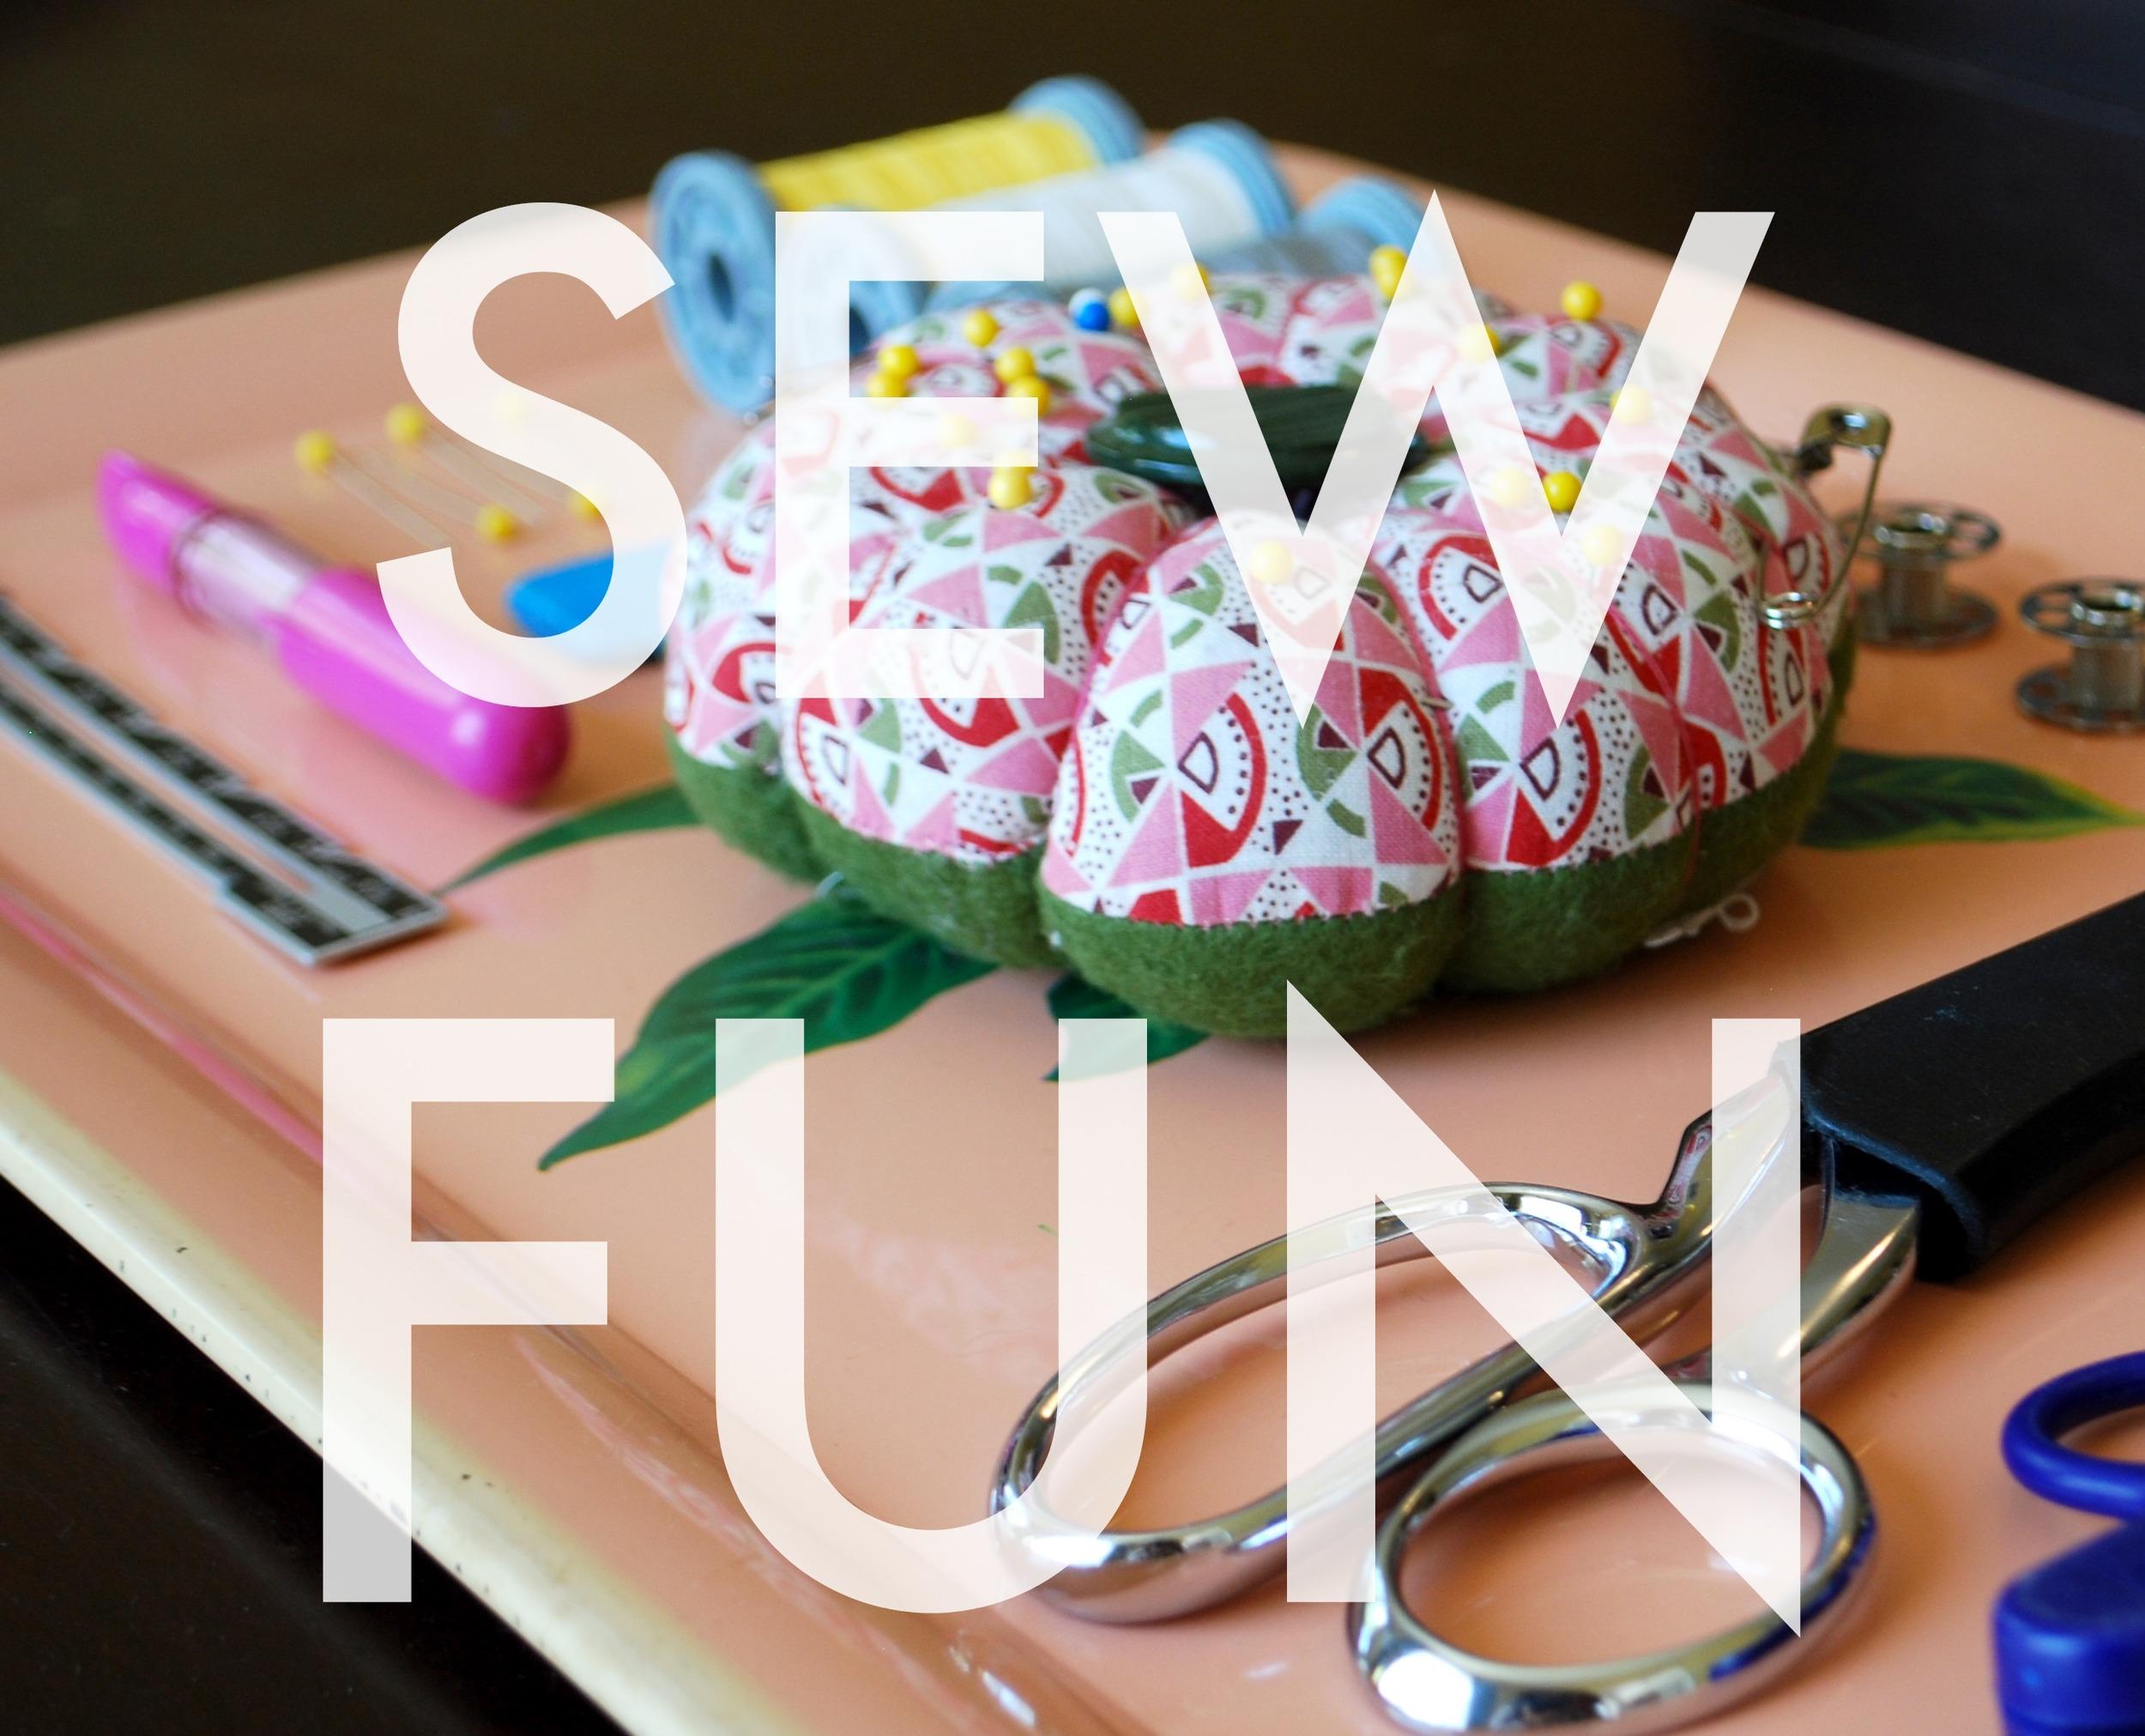 Sew Fun Workshop for Kids | Sew You Studio.com